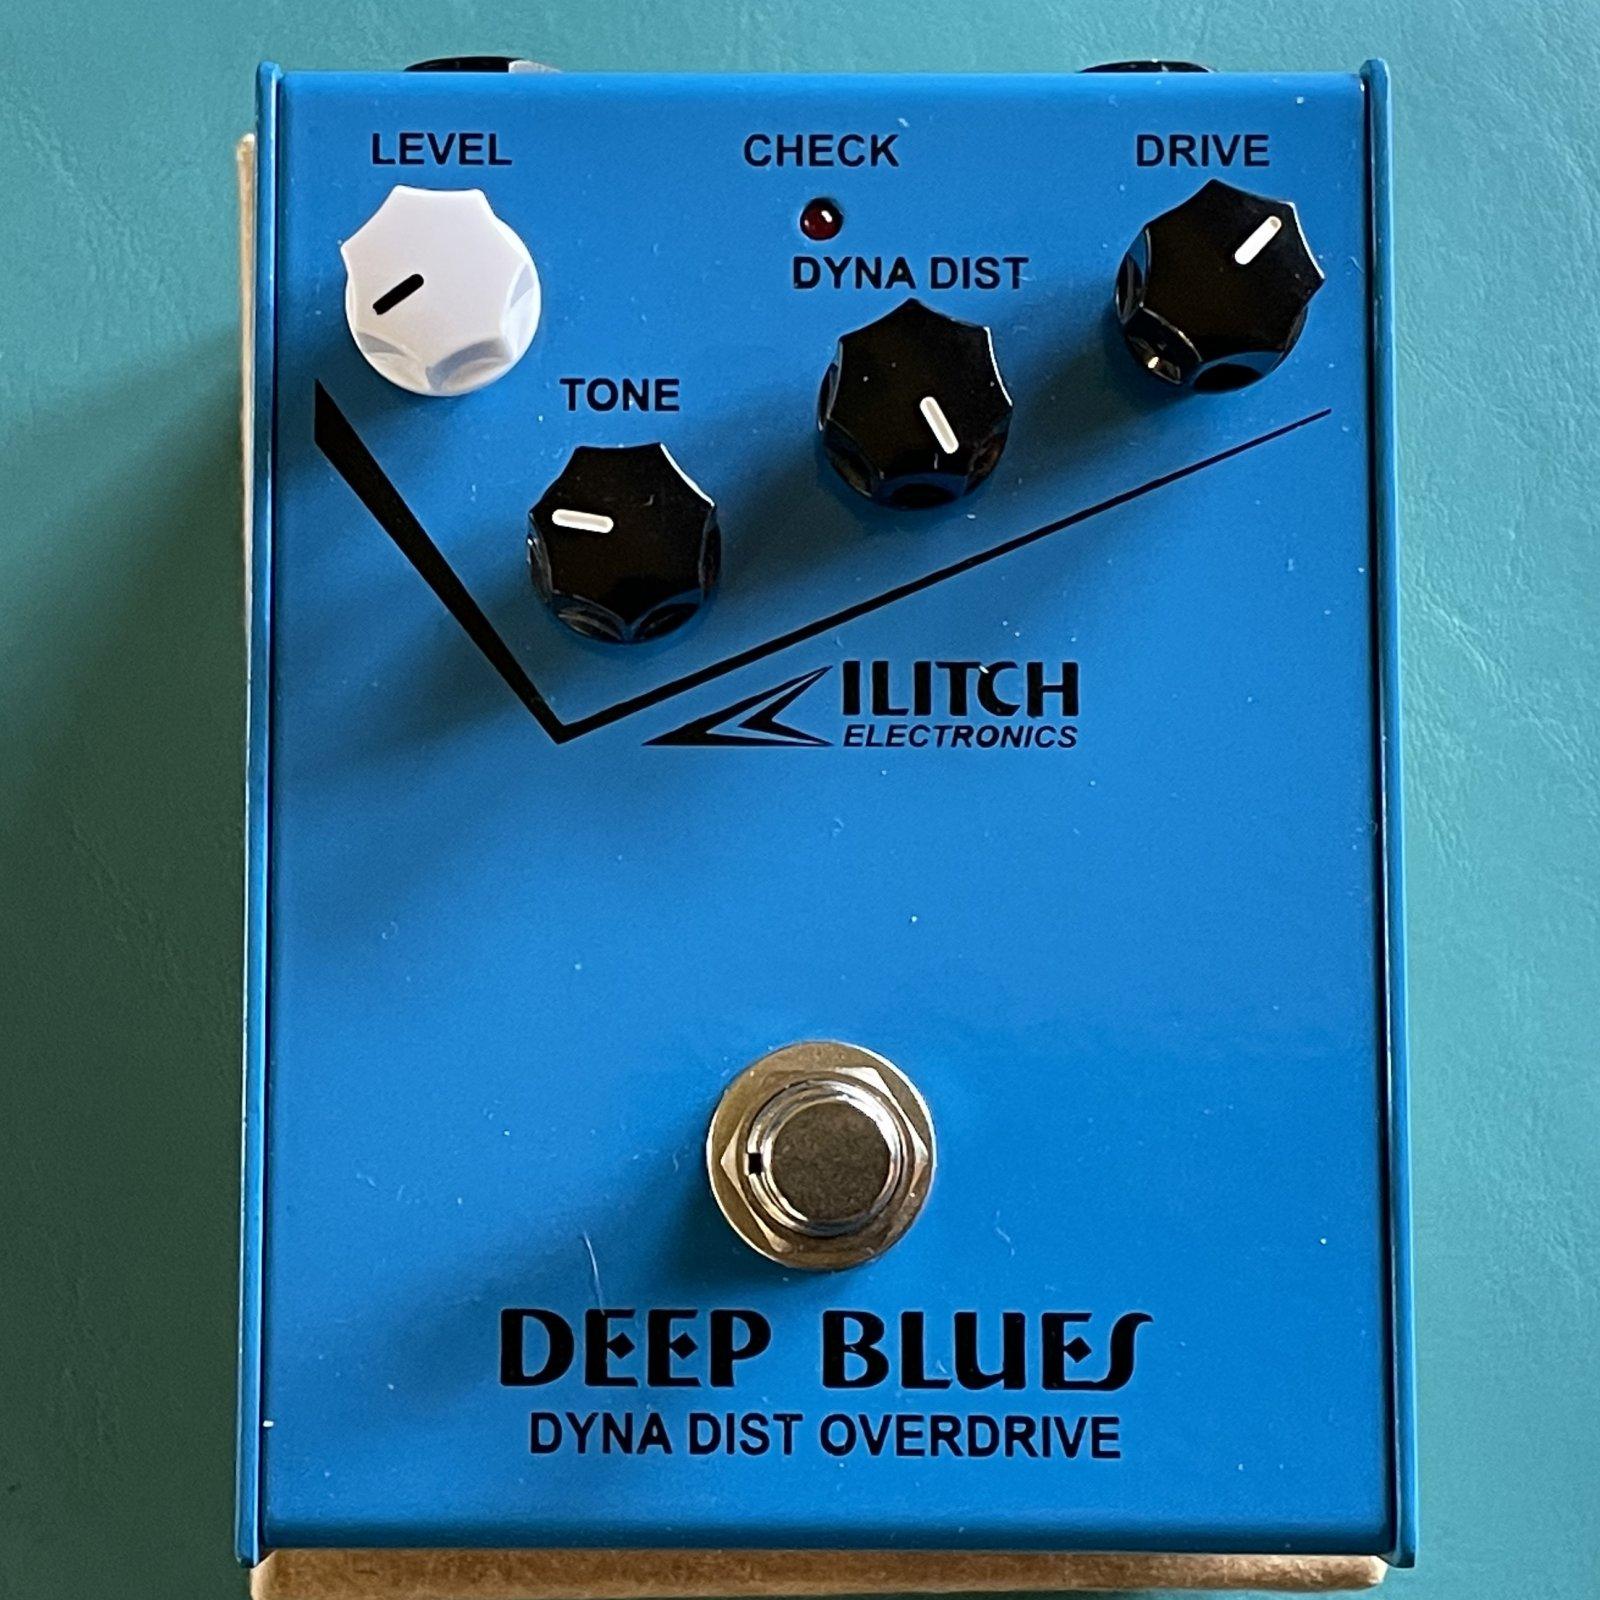 Ilitch Deep Blues Dyna Dist Overdrive